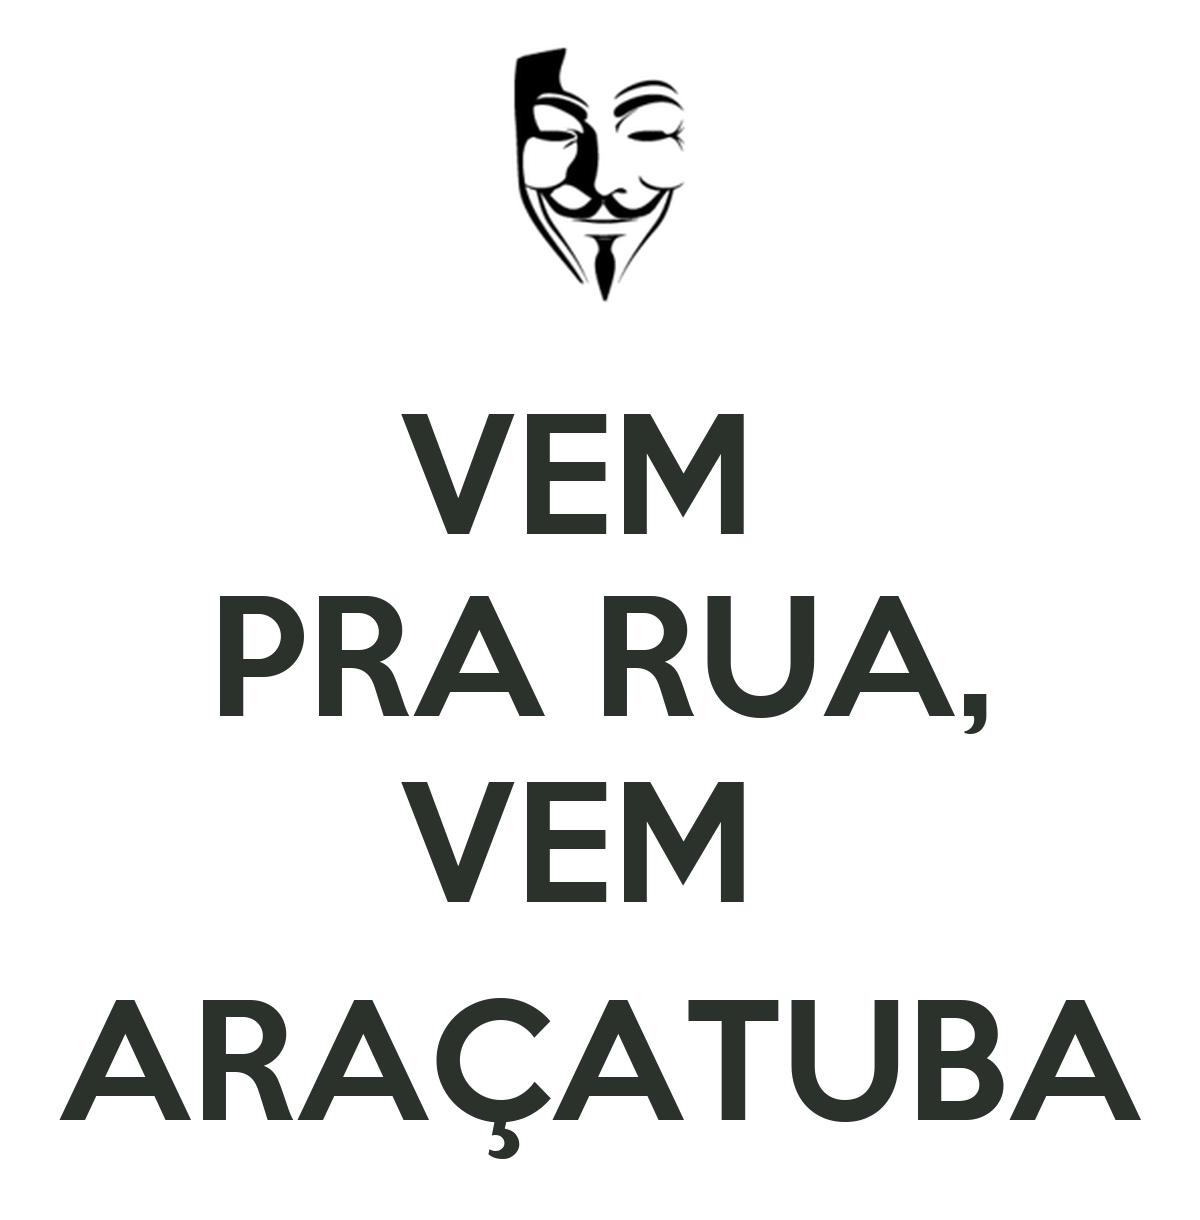 Vem Pra Rua Vem Aracatuba Poster